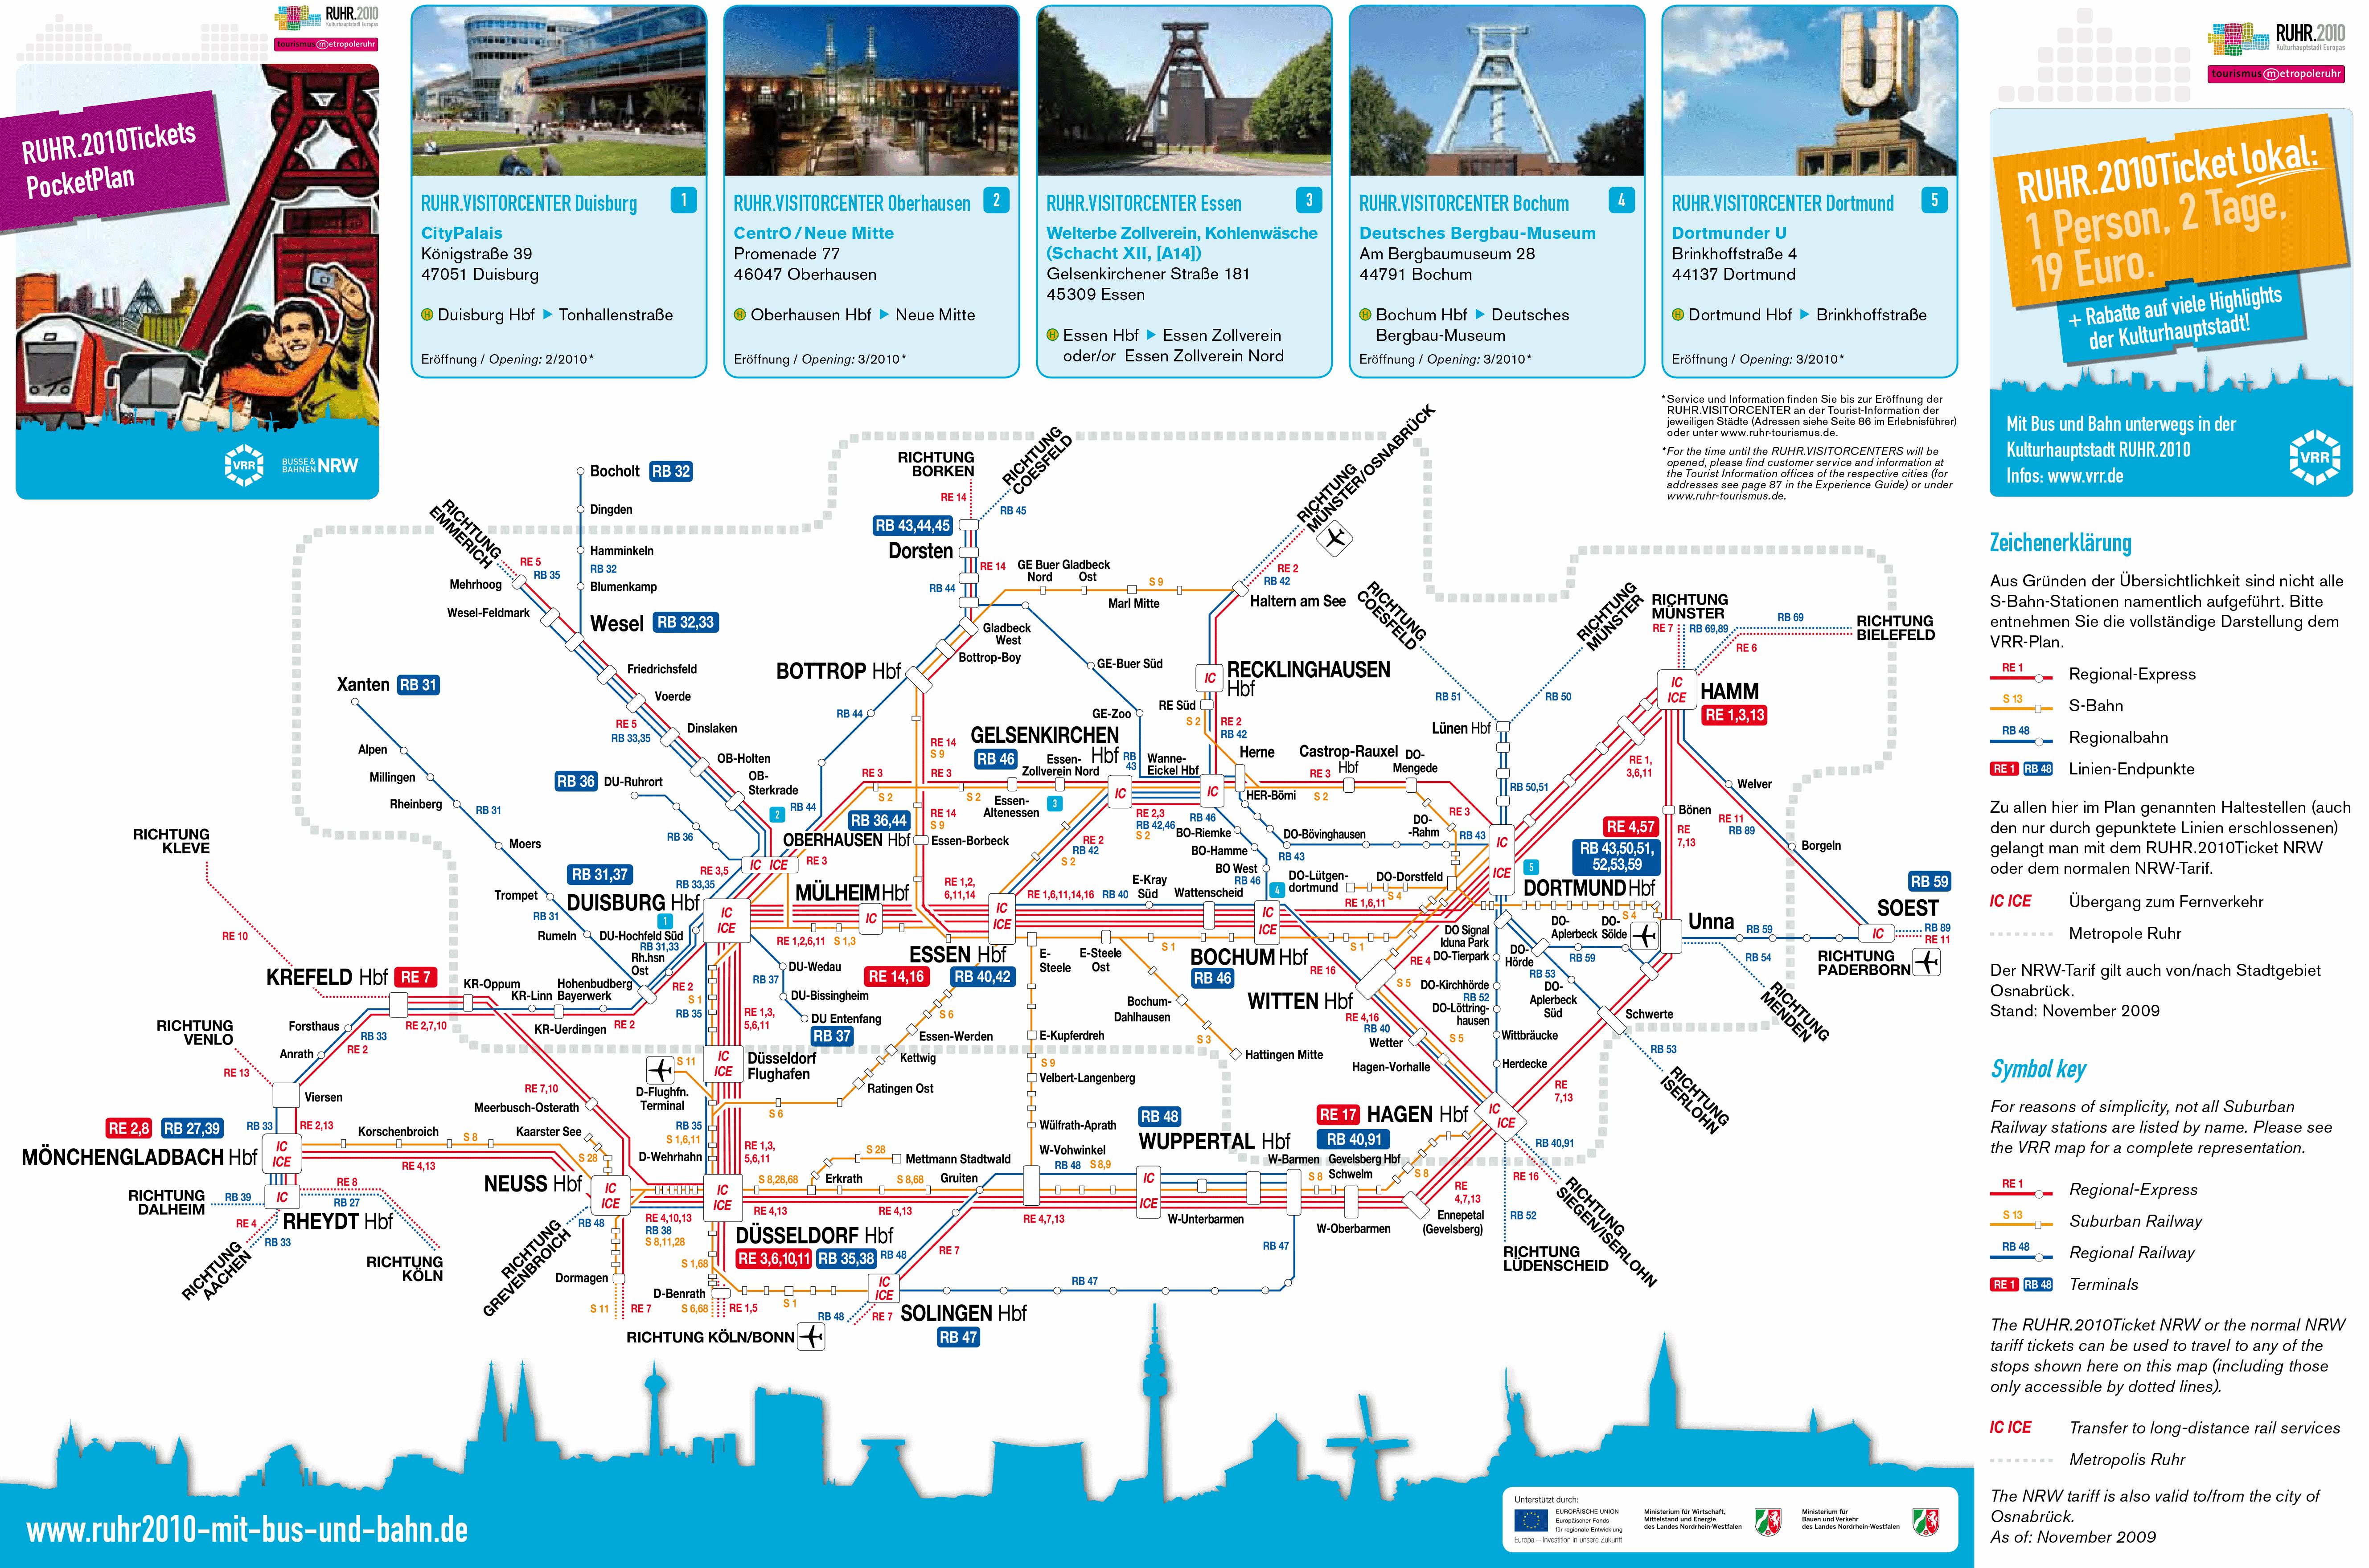 Dusseldorf Subway Map.Mapa Metro Page 2 Of 8 Subway Maps Worldwide